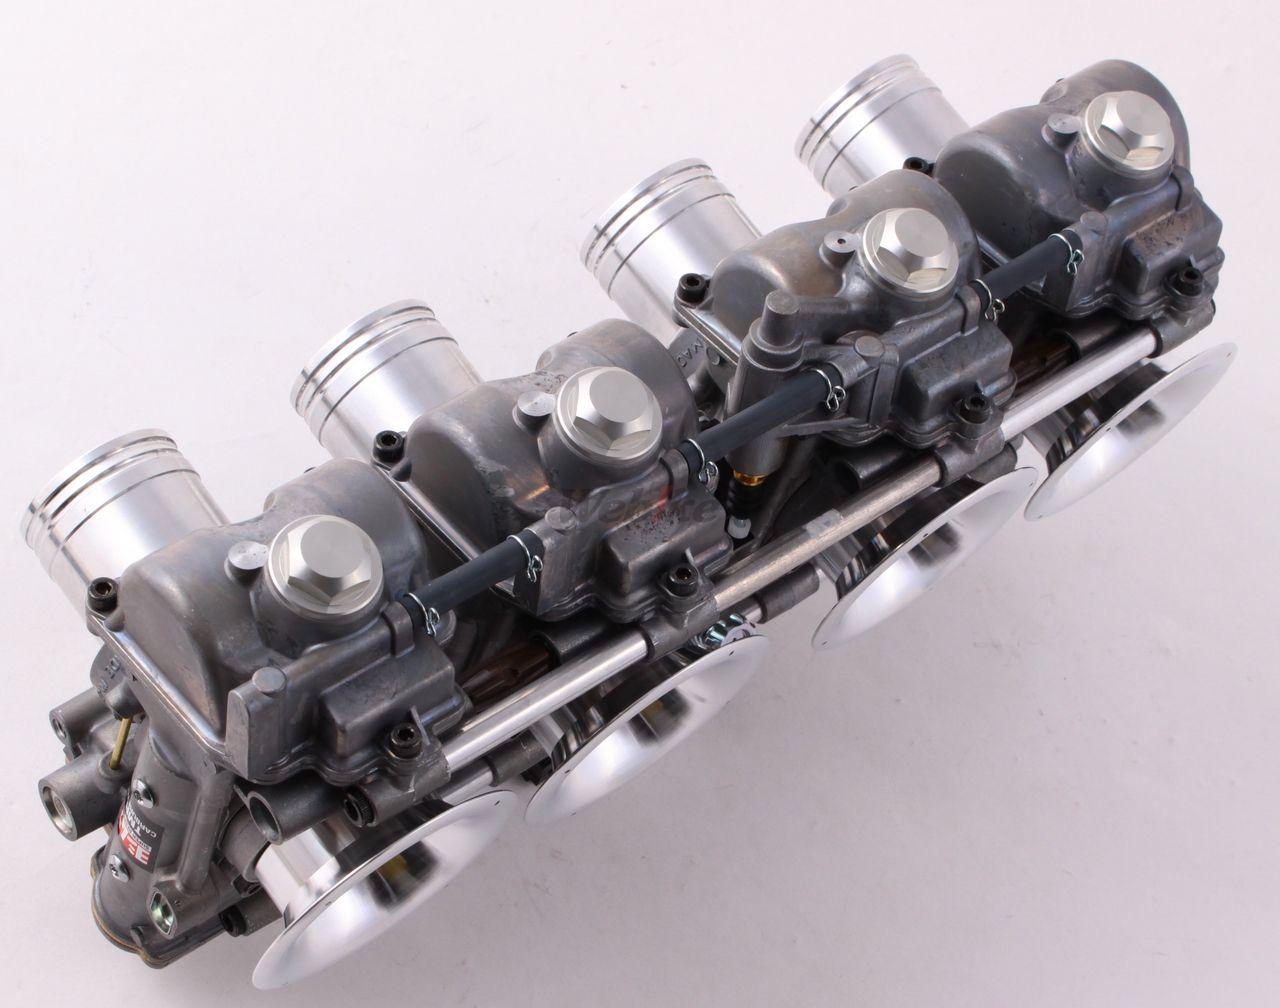 【YOSHIMURA】MikuniTMR38化油器組 - 「Webike-摩托百貨」